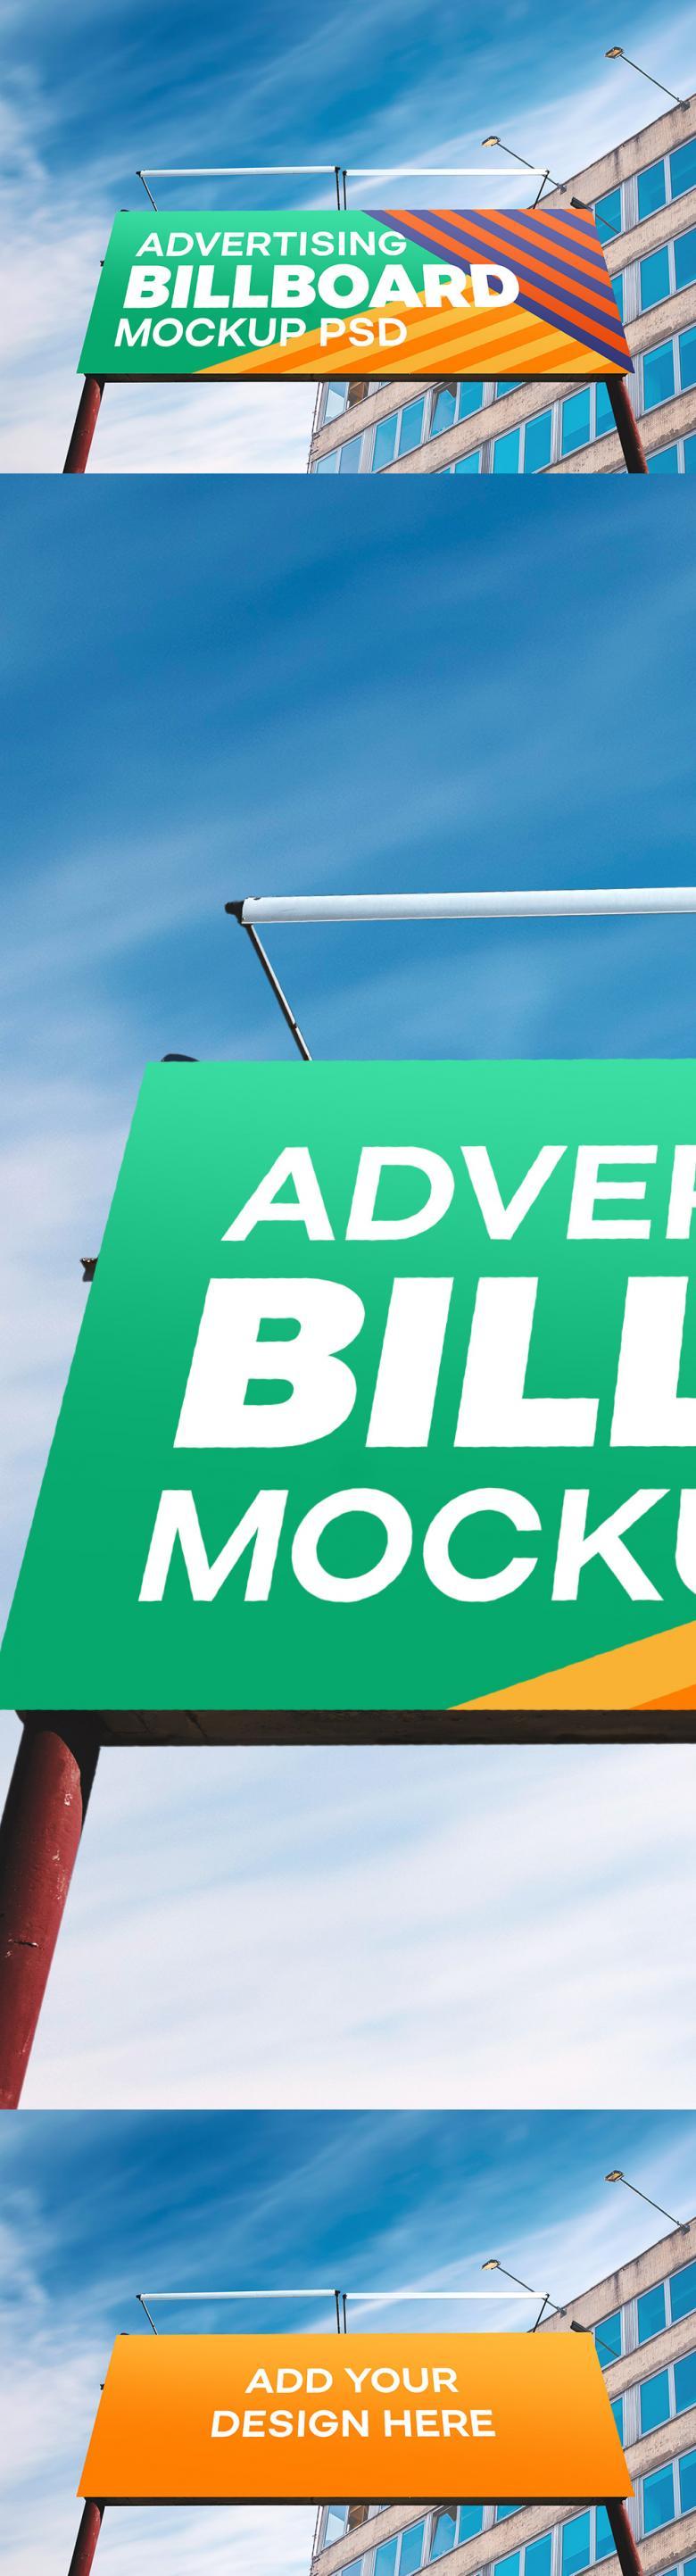 Outdoor Advertising Billboard Mockup